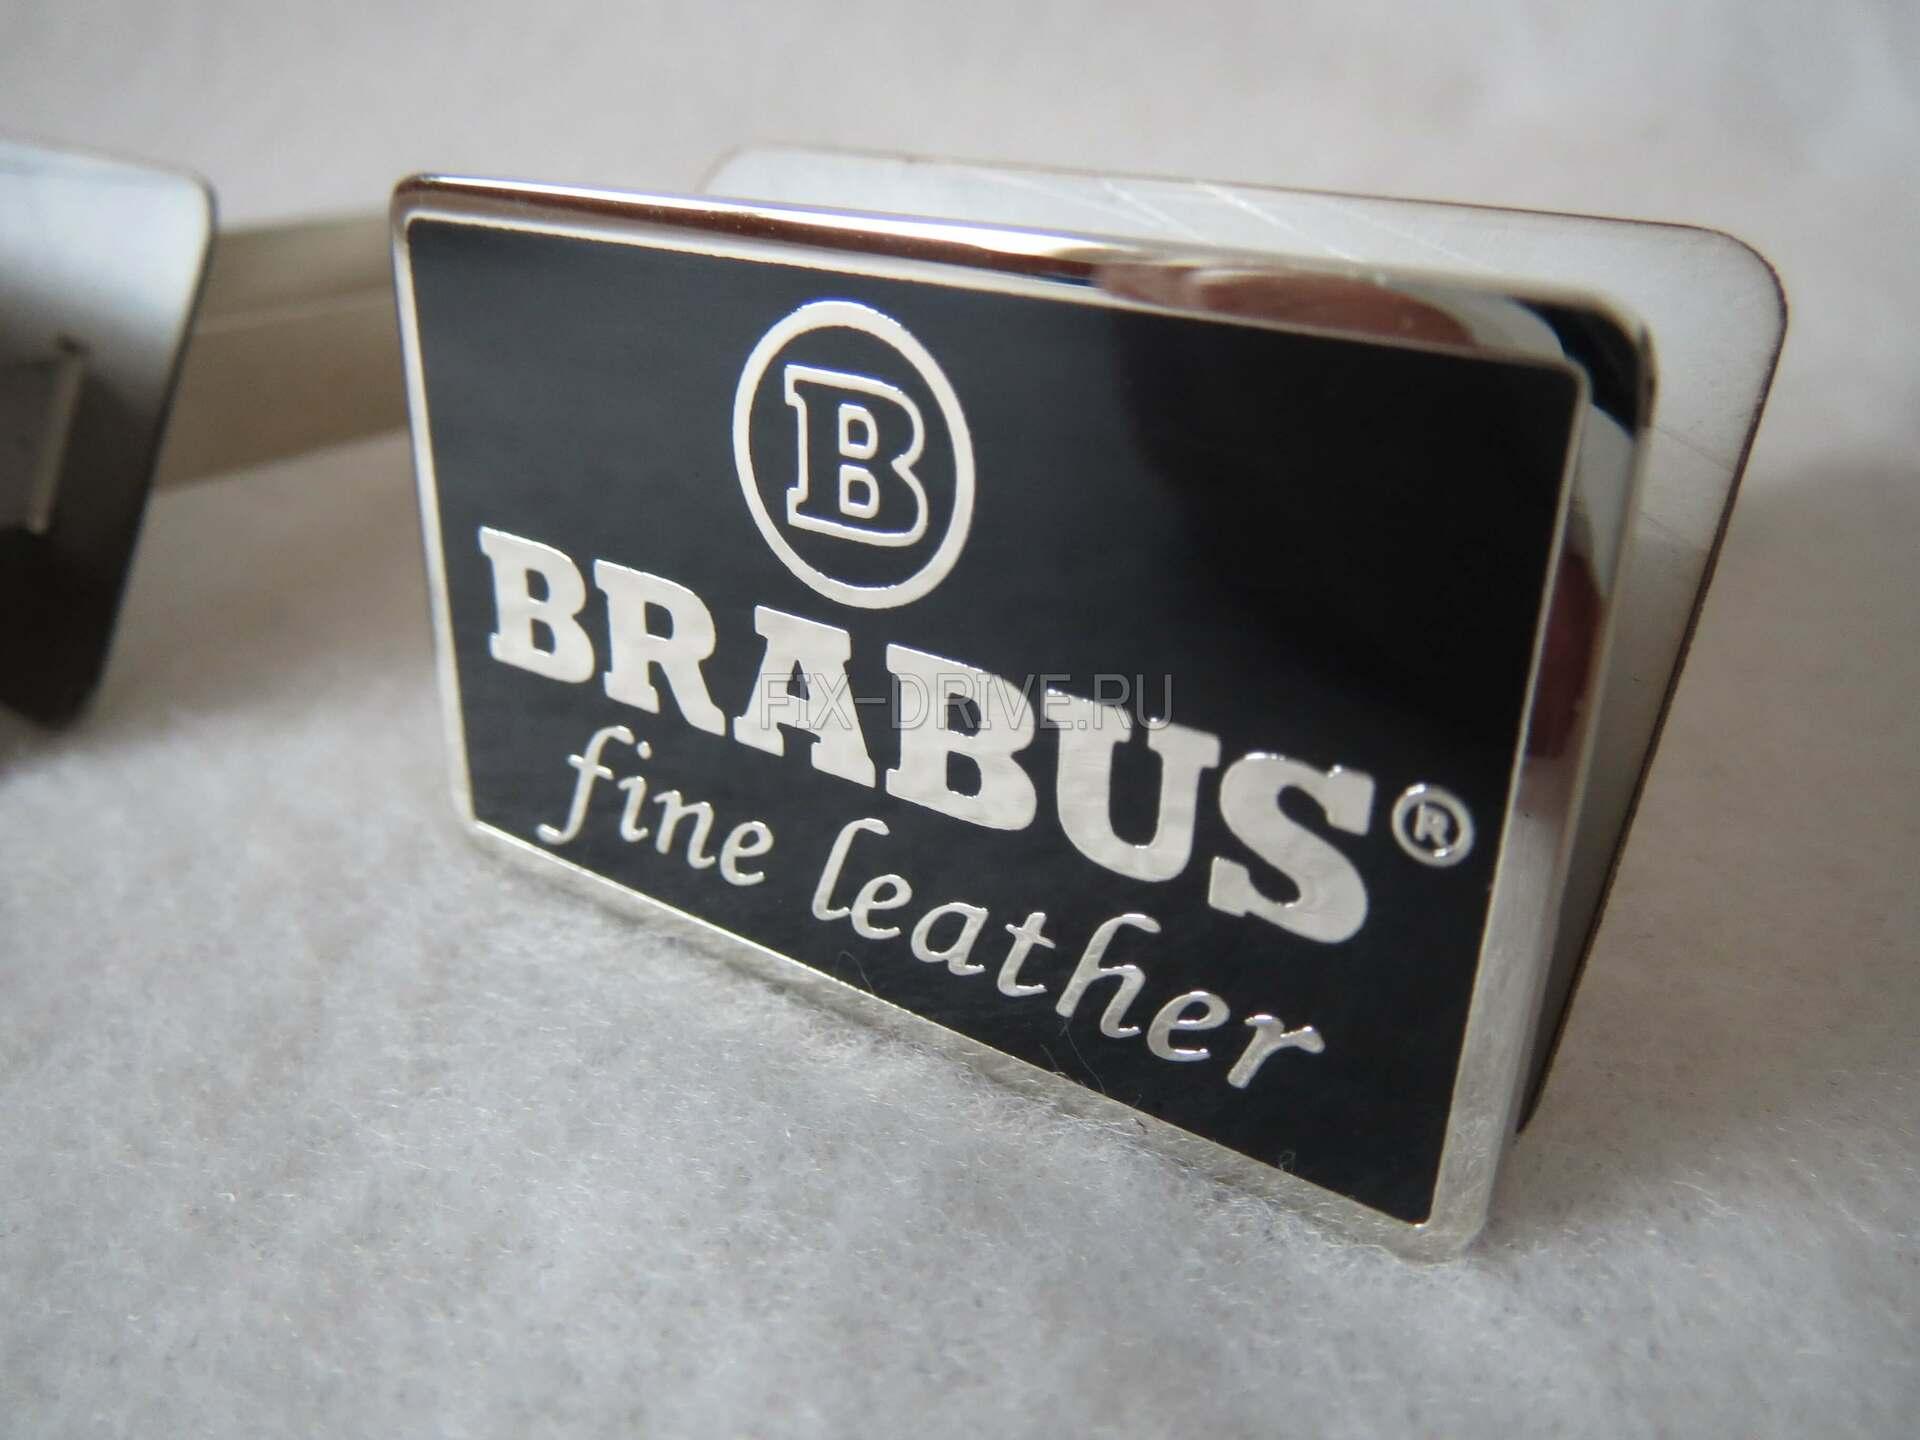 Fine leather BRABUS хром w 464 G-Class Mercedes-Benz эмблемы в сидения